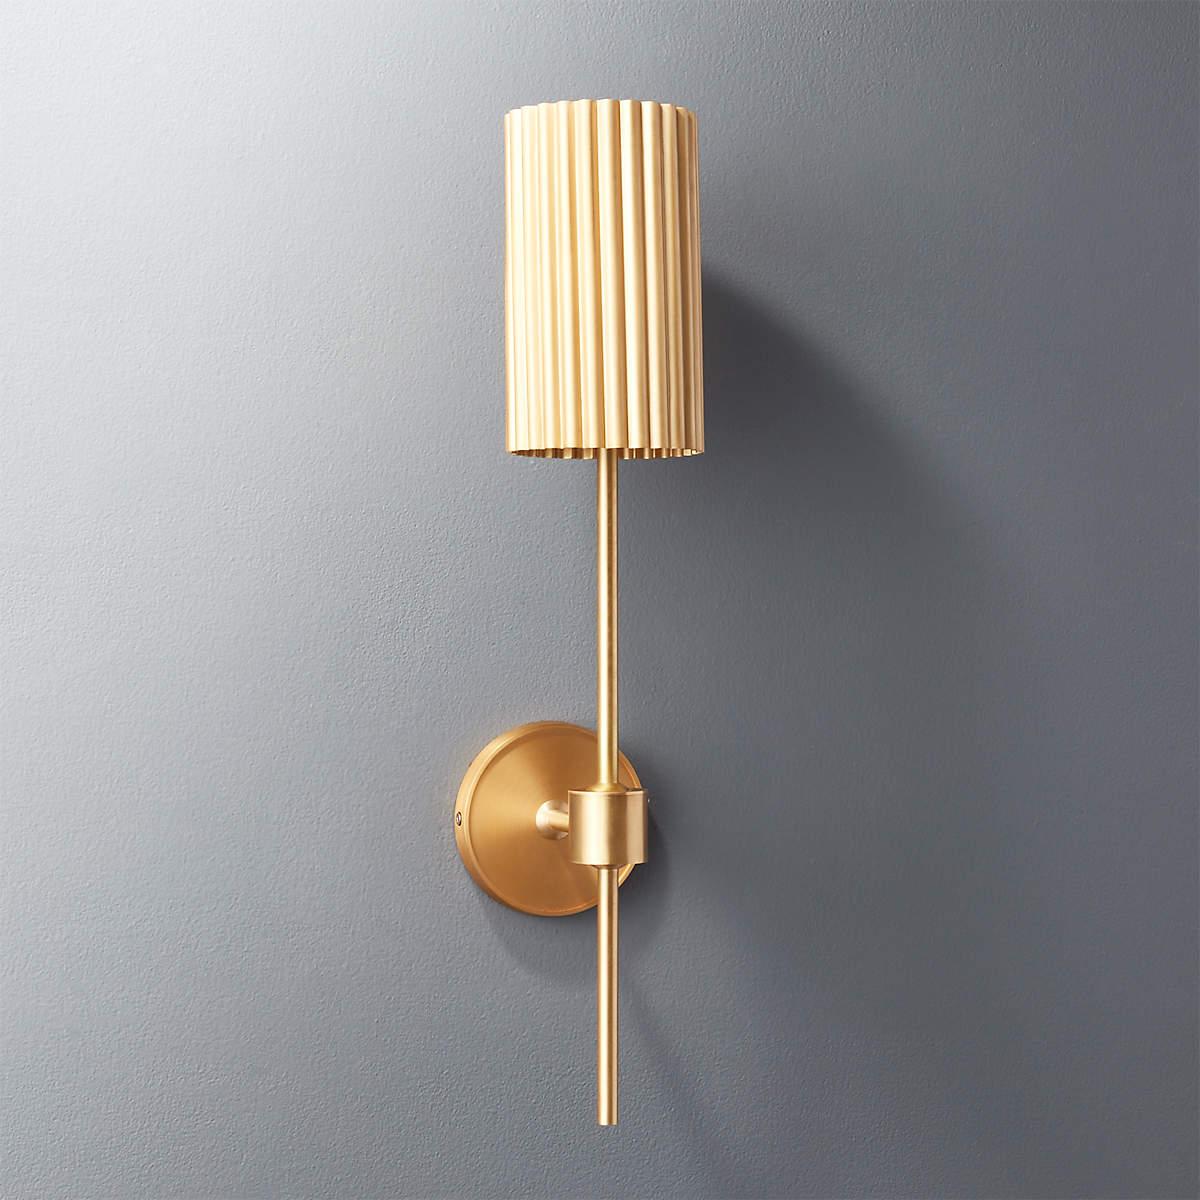 21 ideias para decorar paredes